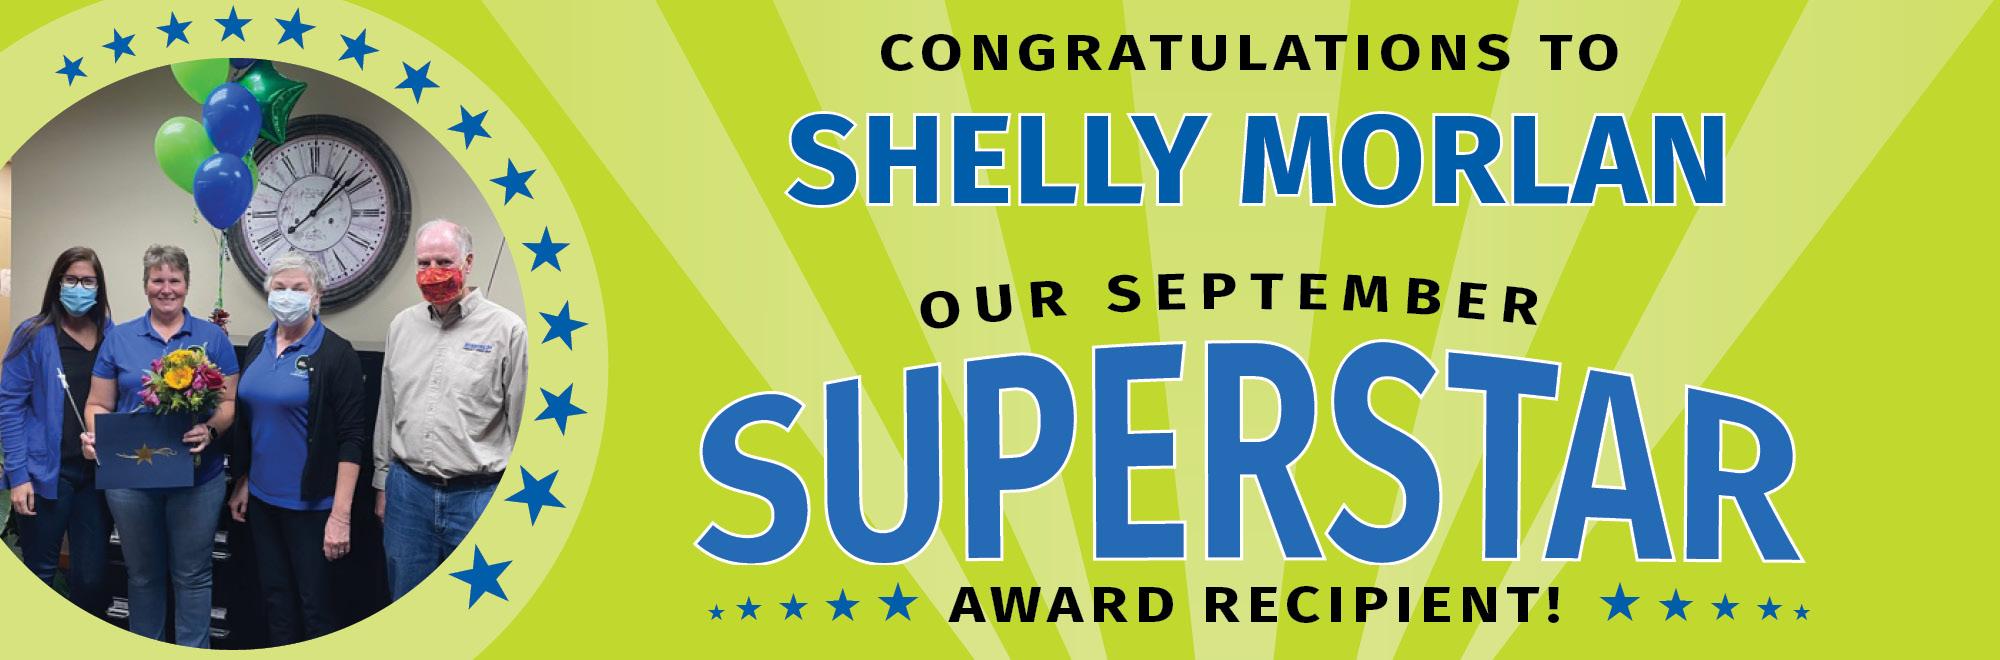 Congratulations to Shelly Morlan, our September Superstar award recipient!